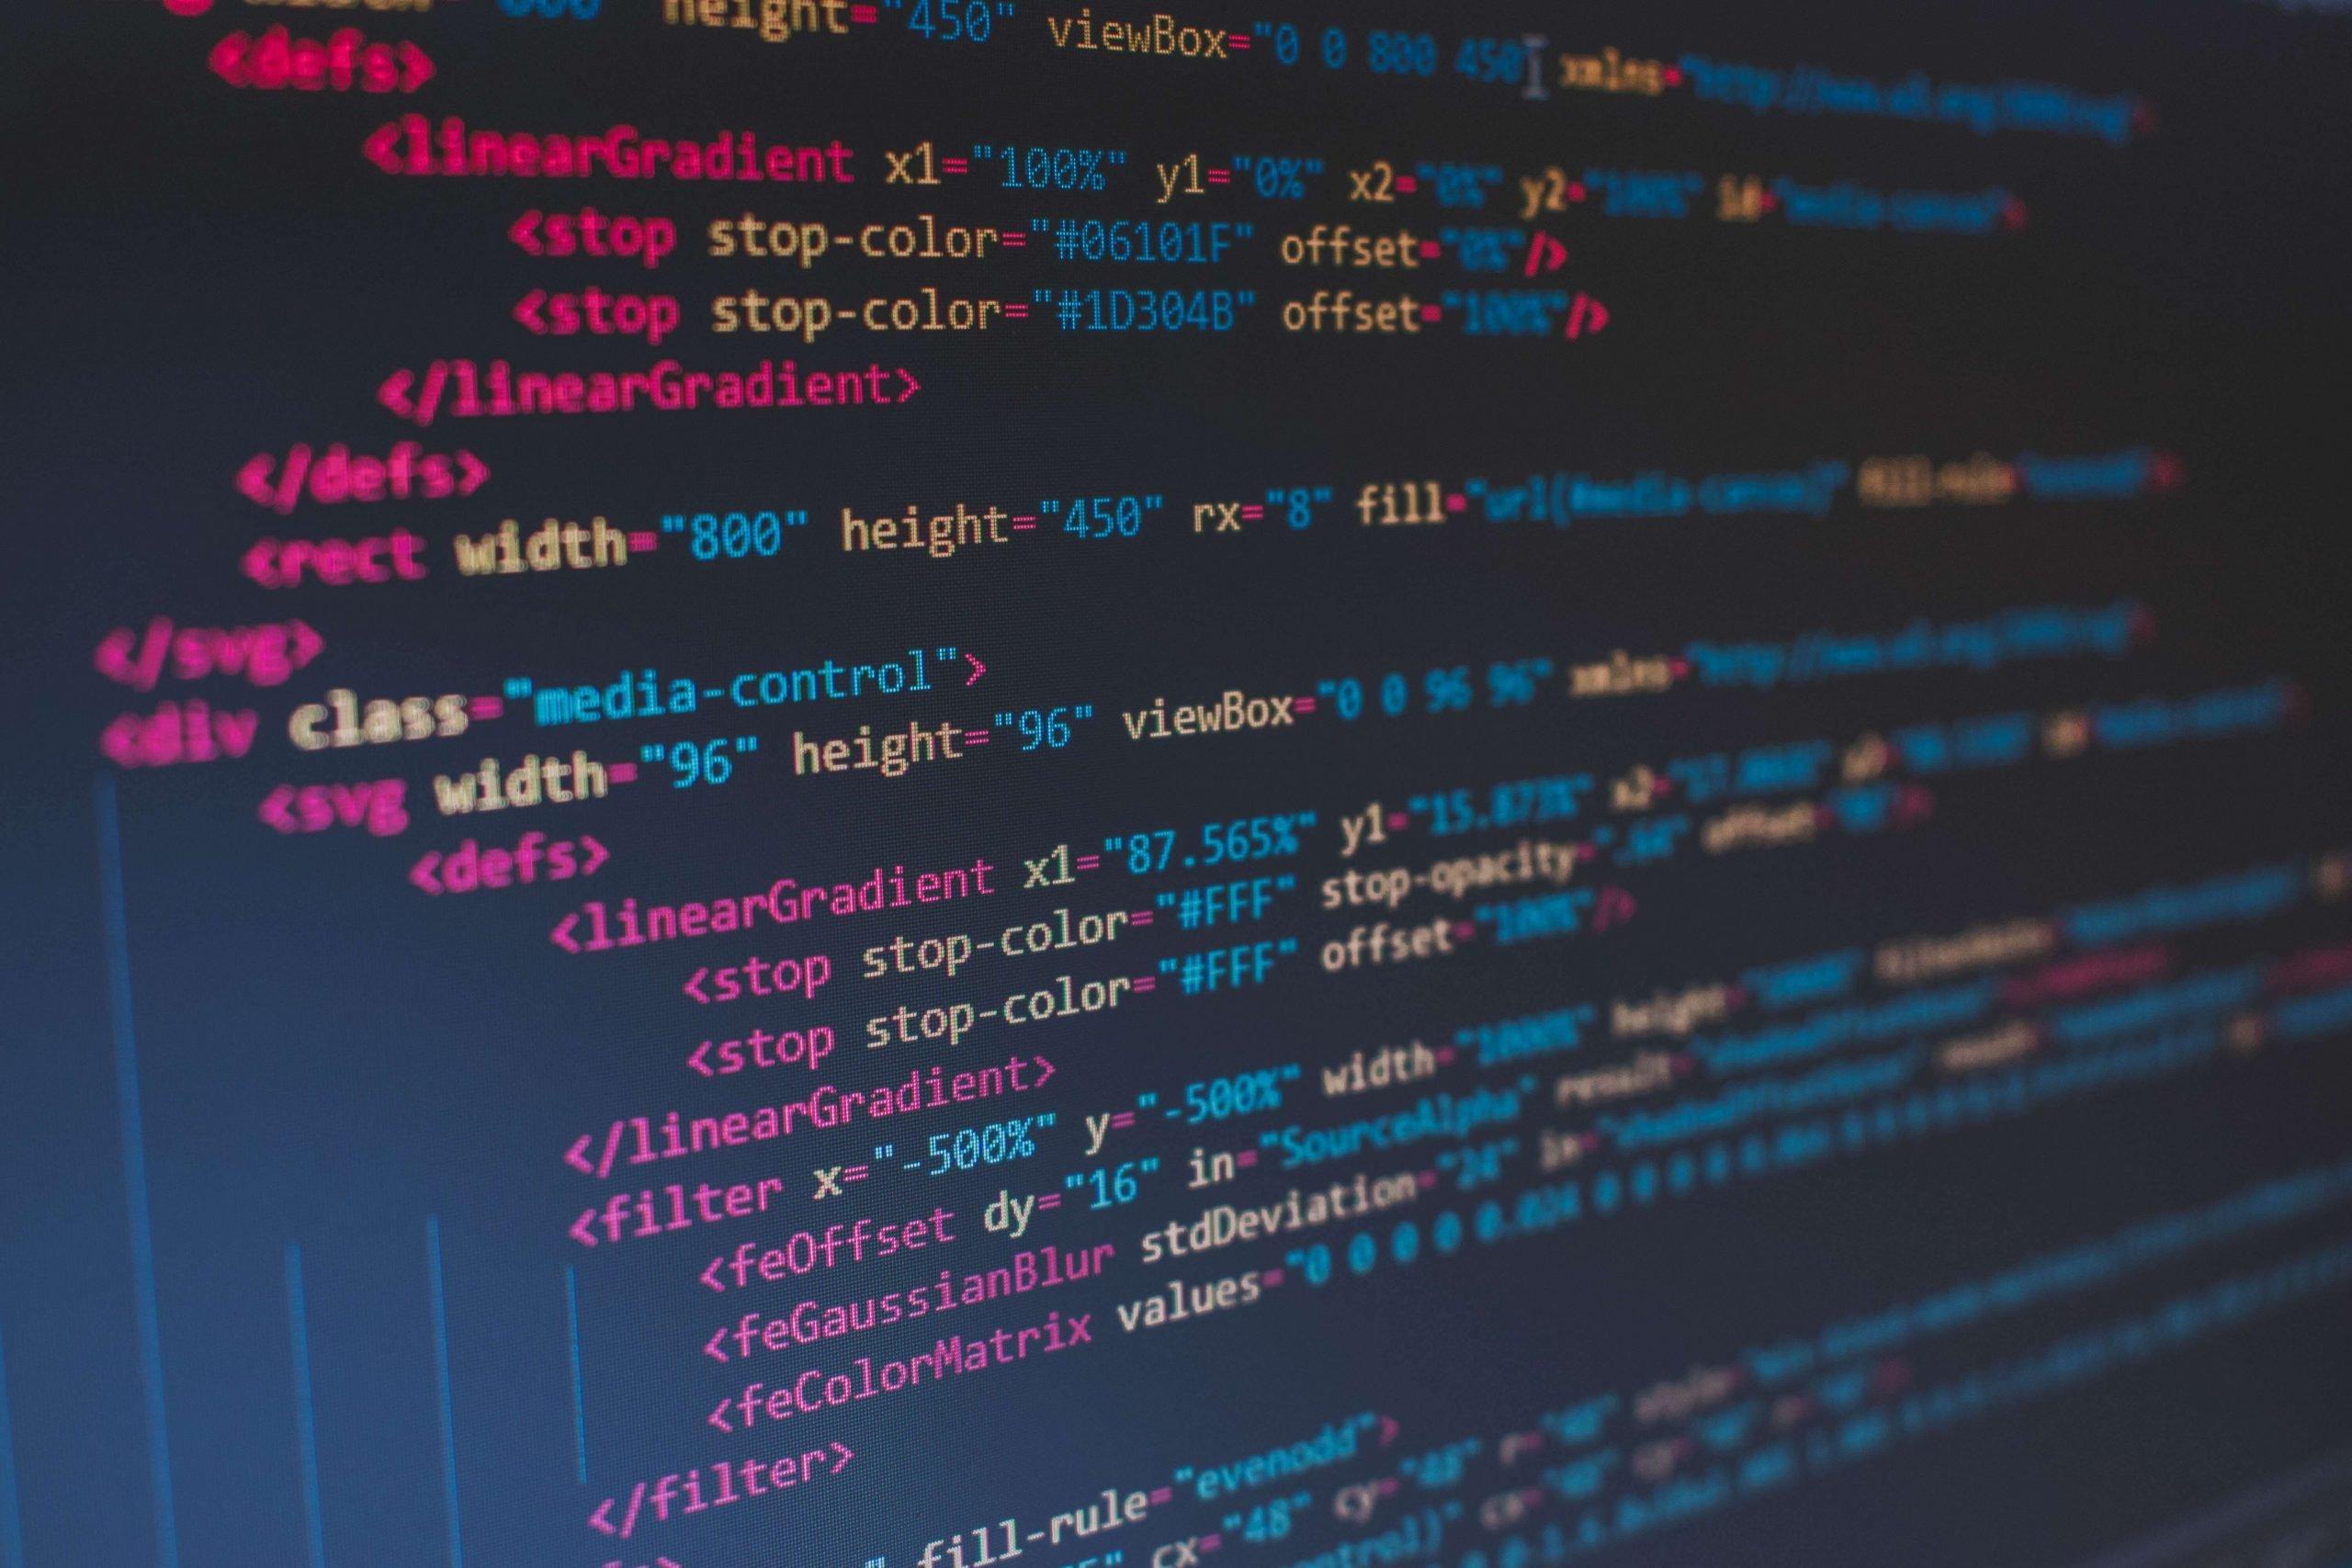 html meta tag for seo